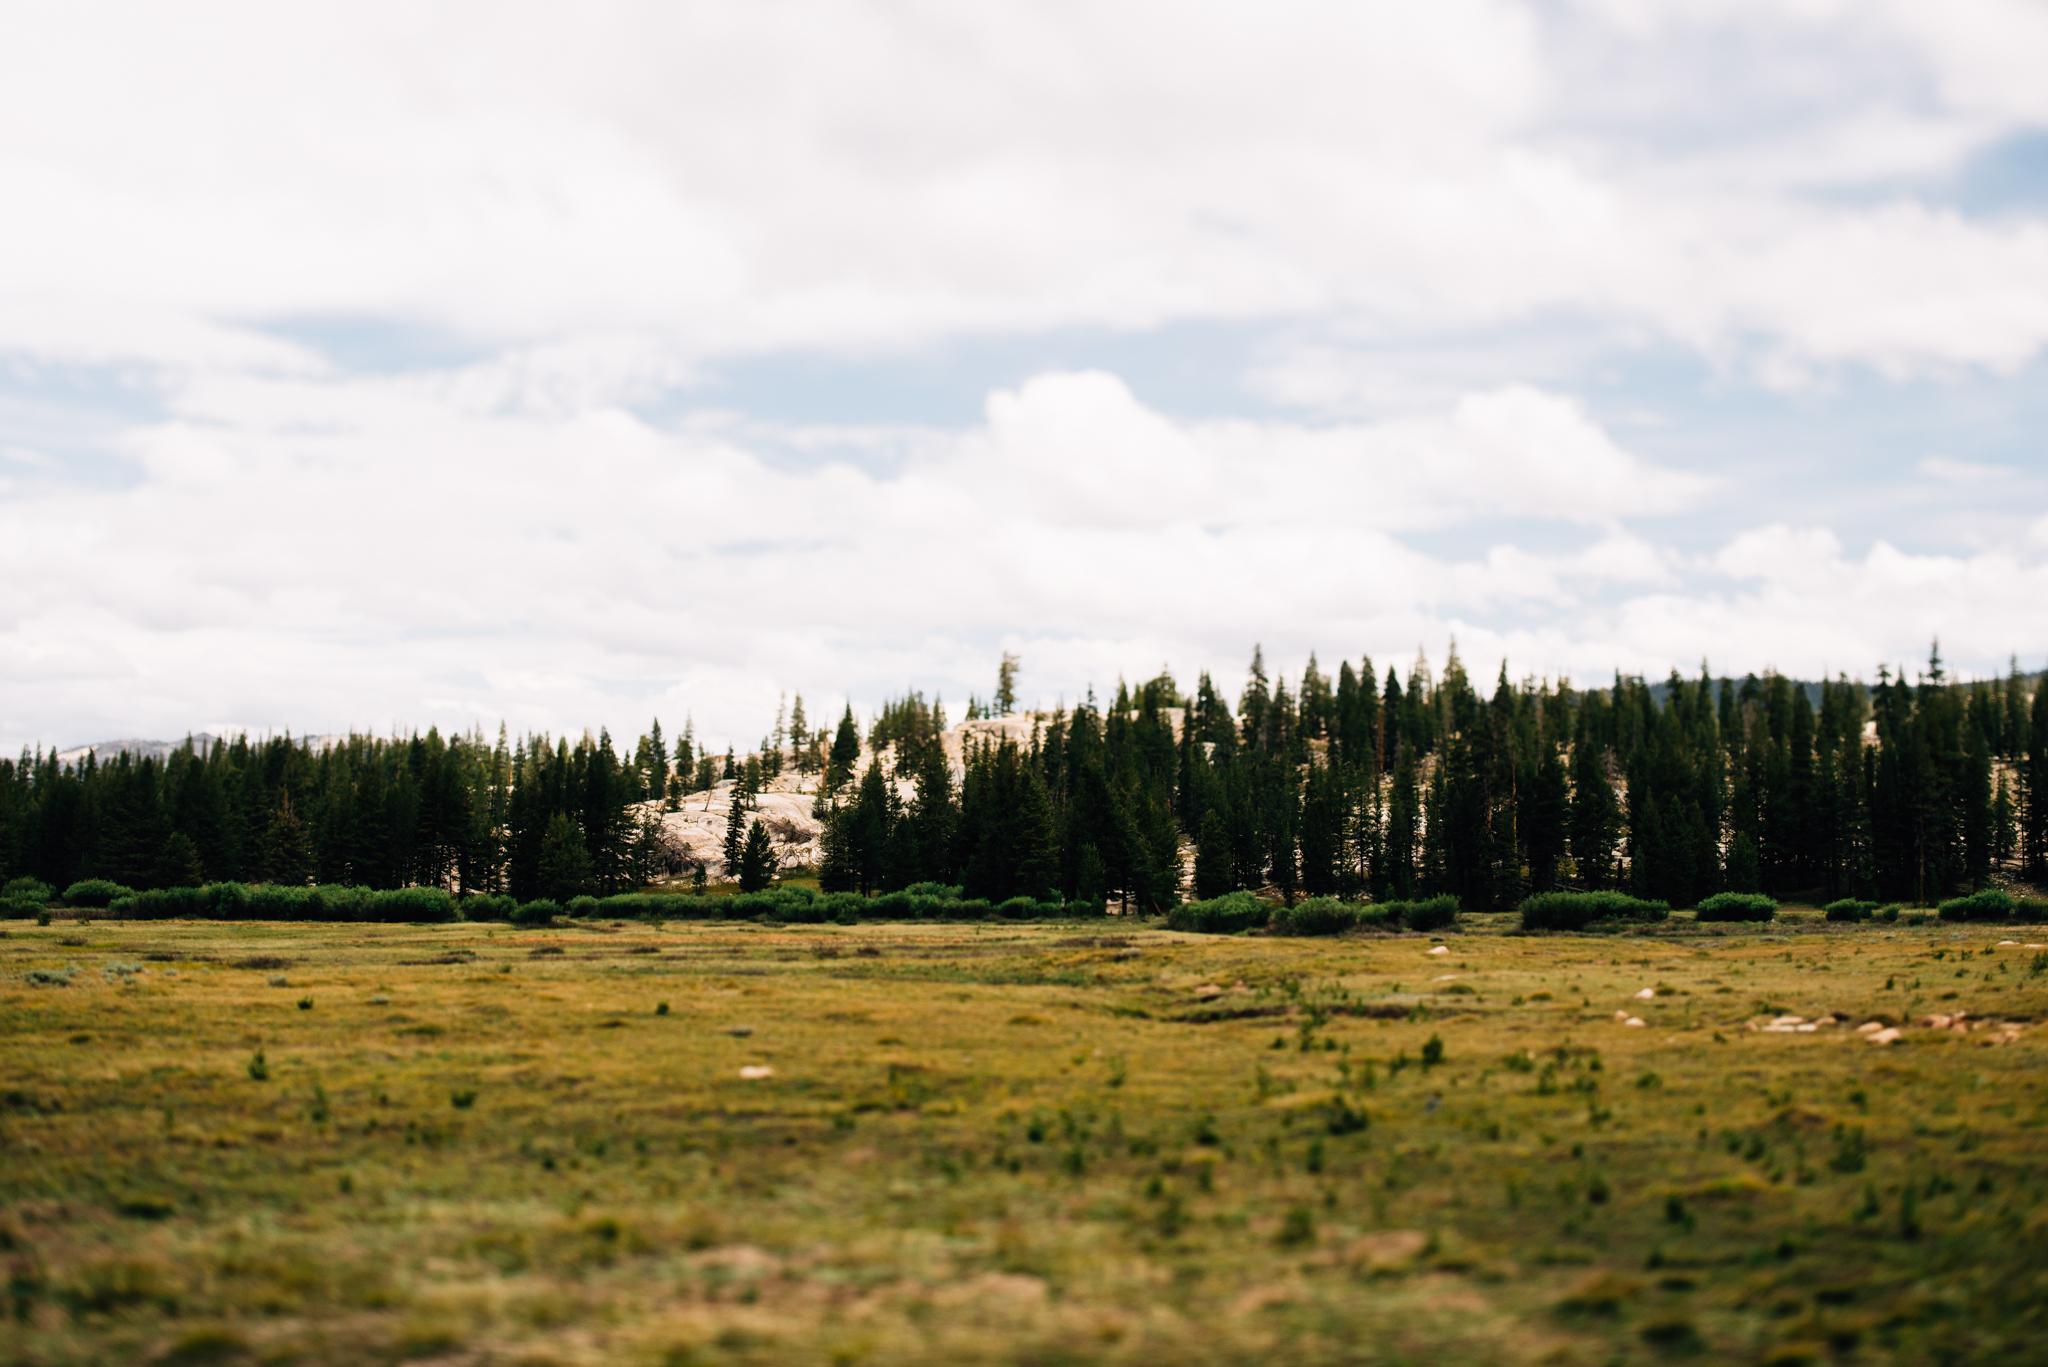 ©The Ryans Photography - Los Angeles Travel - Tuolomne Meadows Yosemite-025.jpg